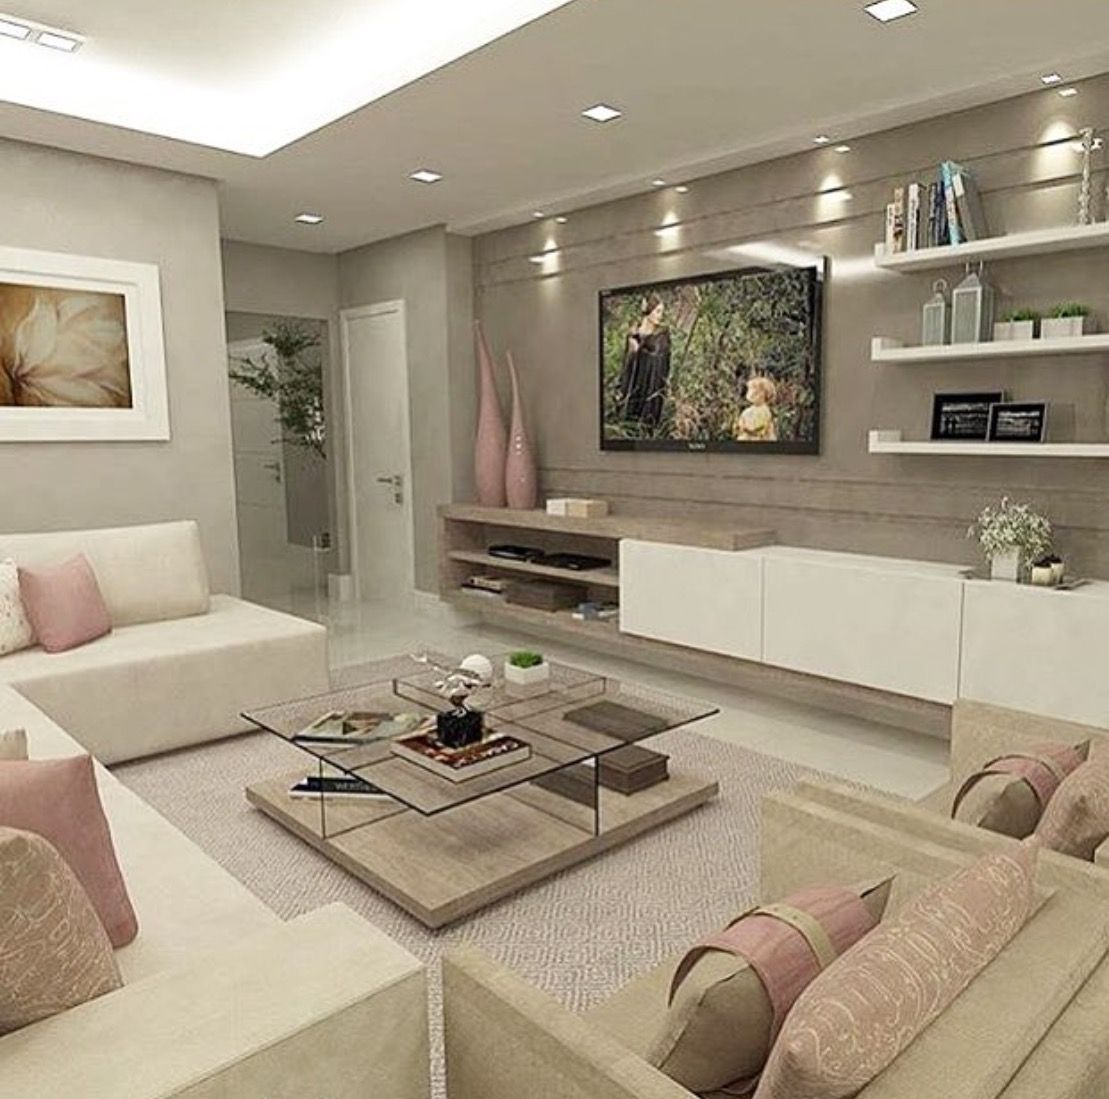 Pin By Daniela Maskova On House Decor Home House Design Living Room Decor View home decor for small living room